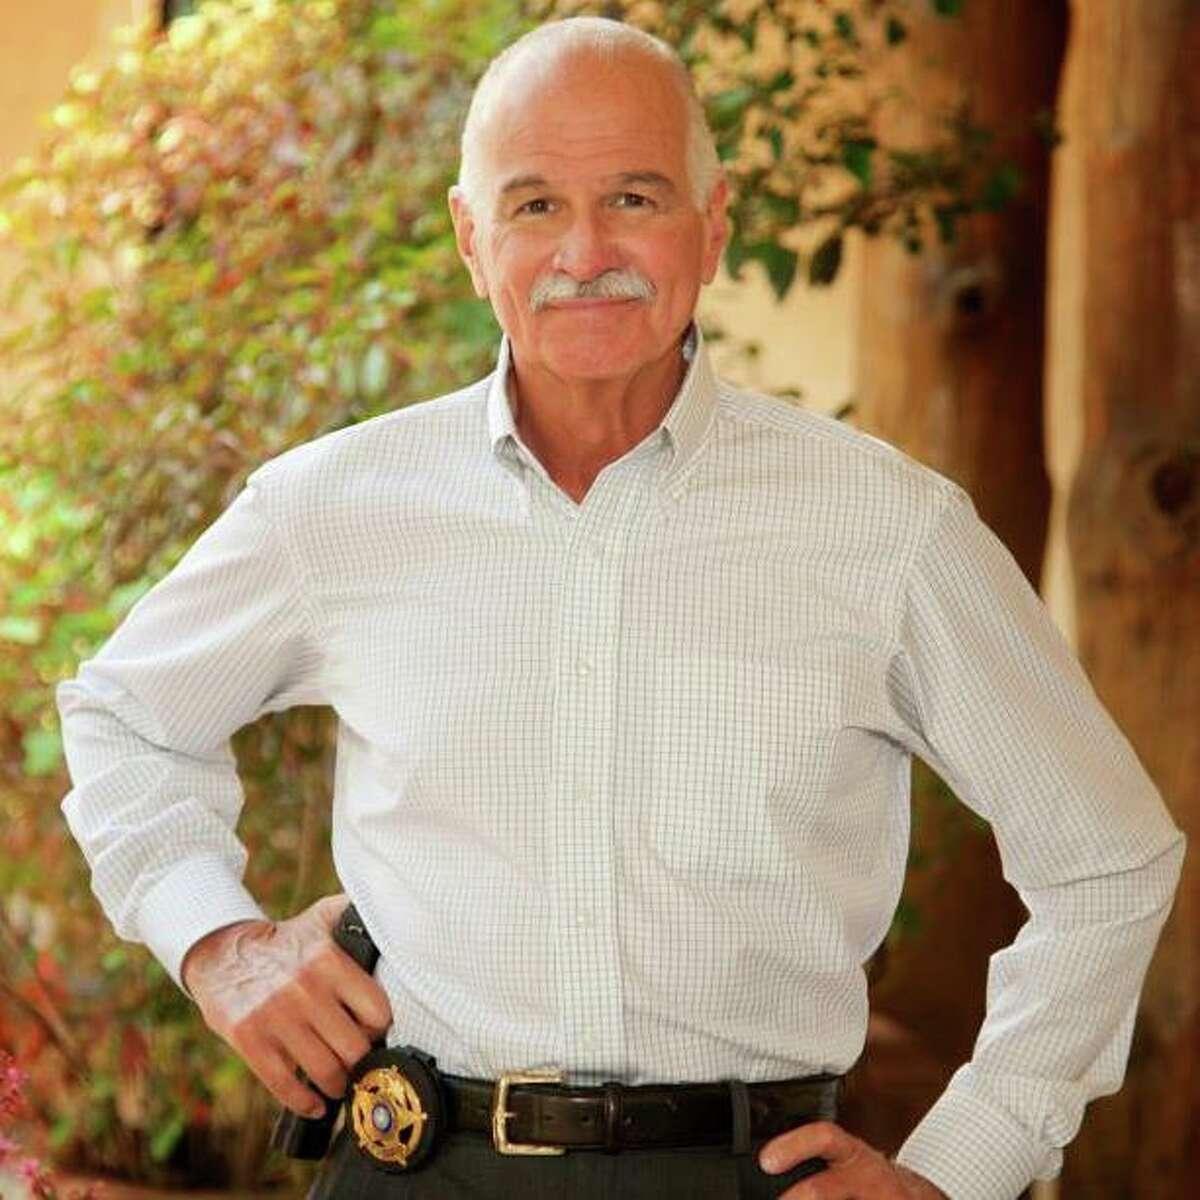 Joe Danna is running for Harris County Sheriff